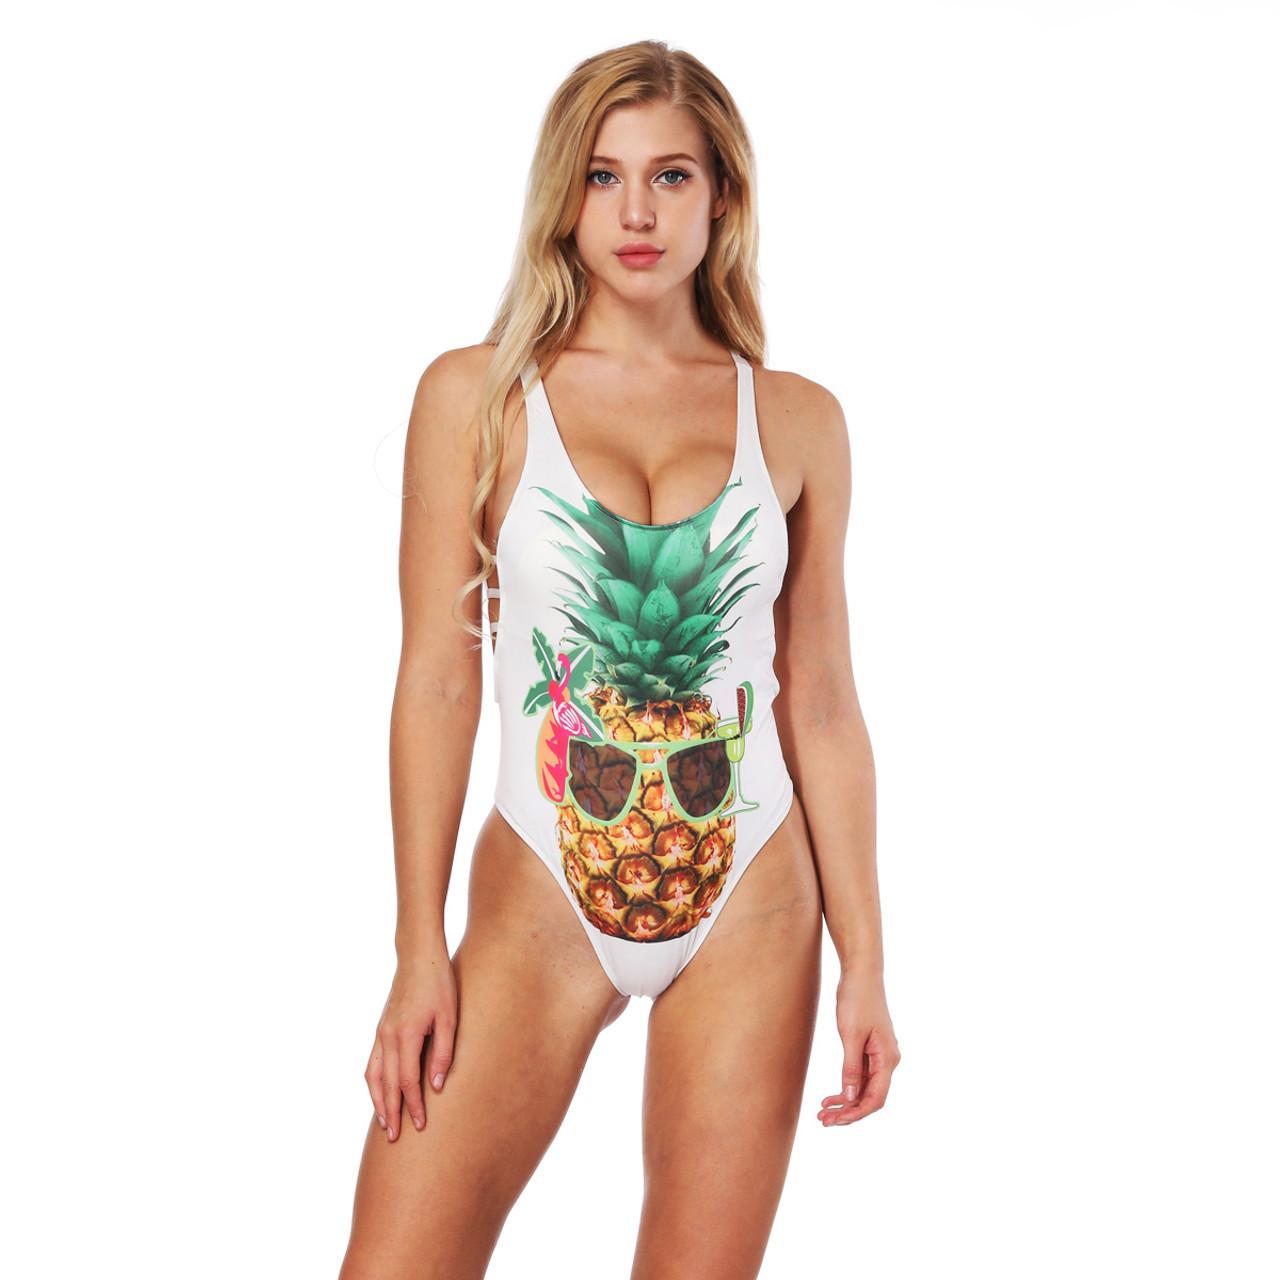 meilleur authentique 16a41 eeb01 Cool Pineapple 3D Print One Piece Swimsuit Women Swimwear Cartoon Monokini  Maillot De Bain Femme Bodysuit Female Bathing Suit